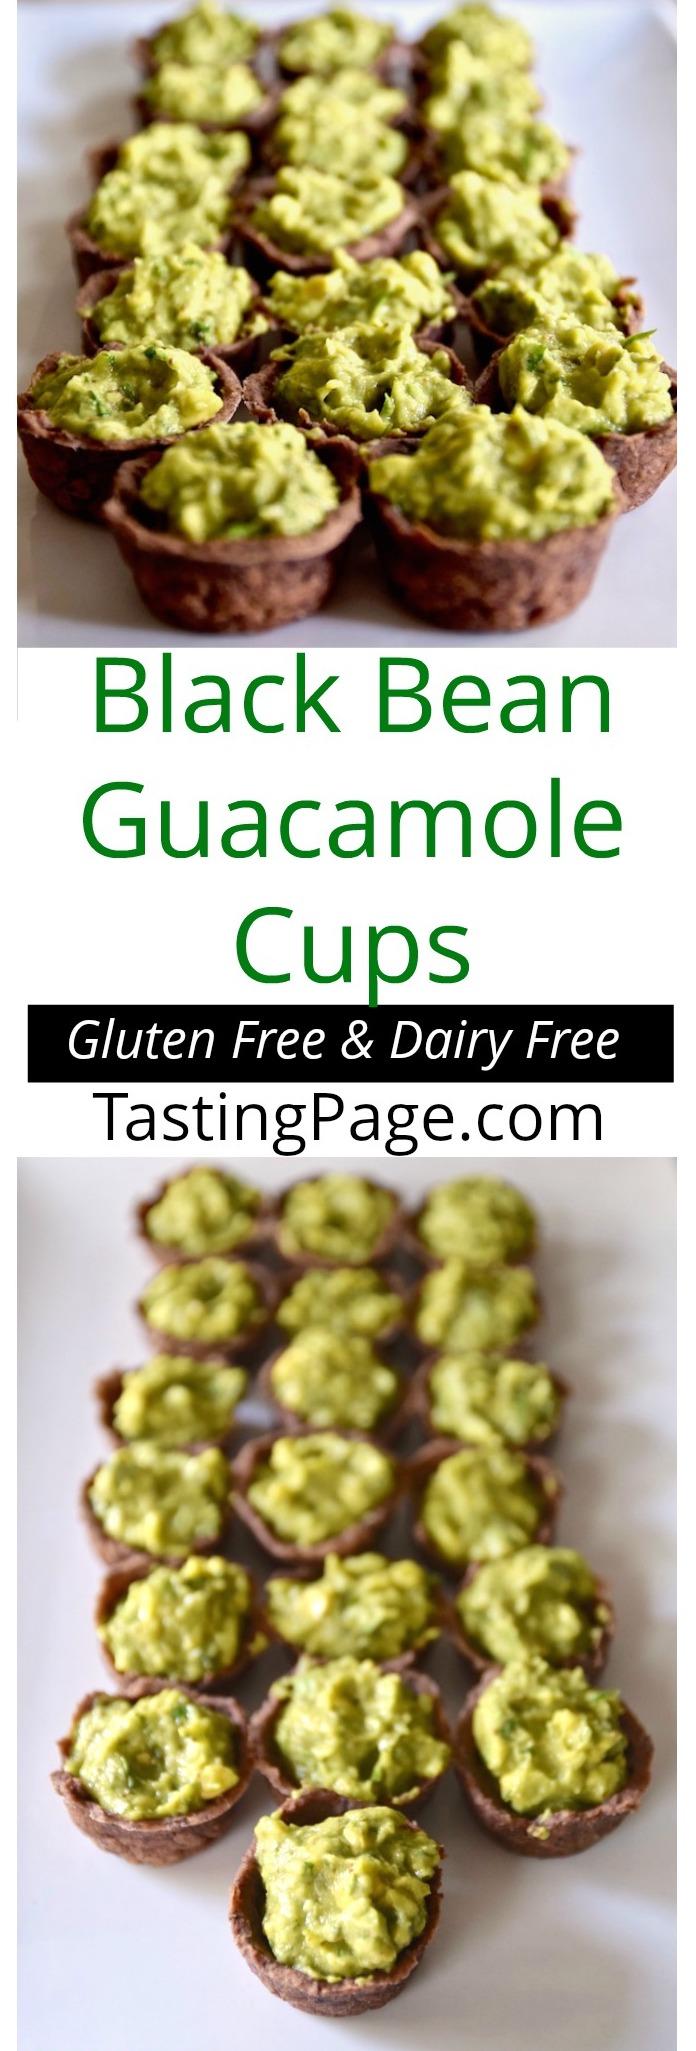 Black Bean Guacamole Cups {Gluten Free, Dairy Free